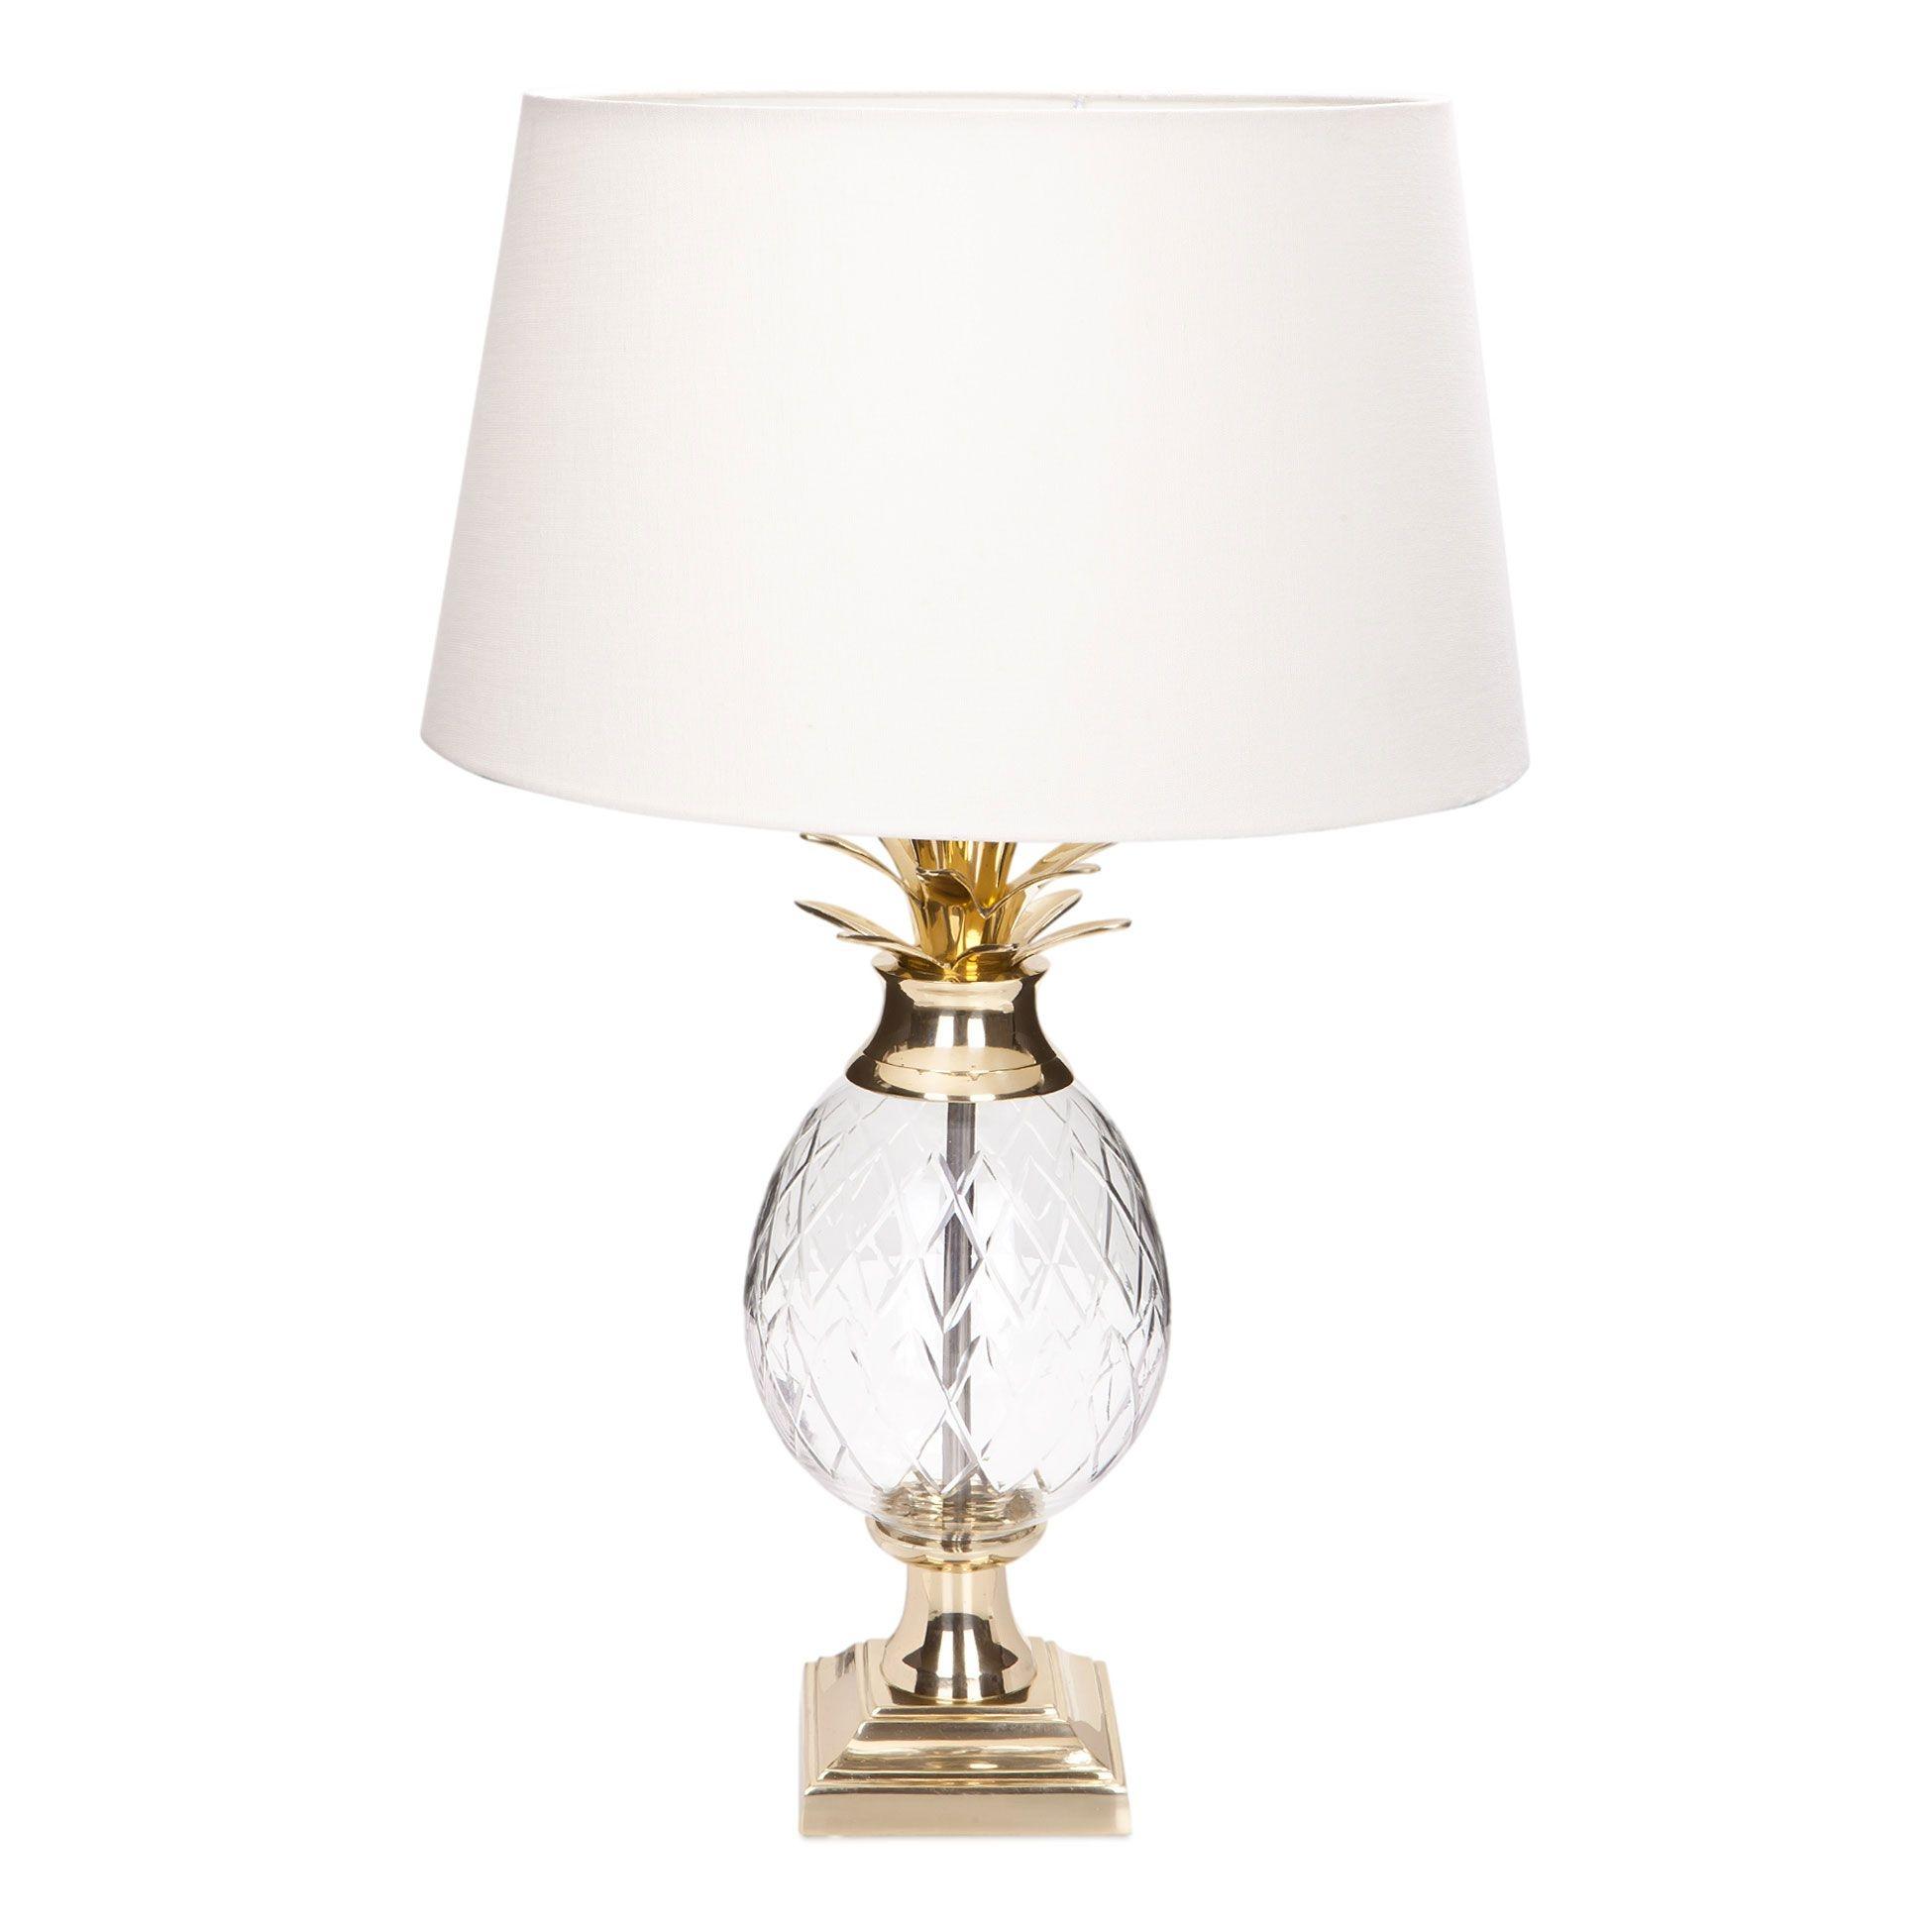 Elegant Pineapple Table Lamp 21